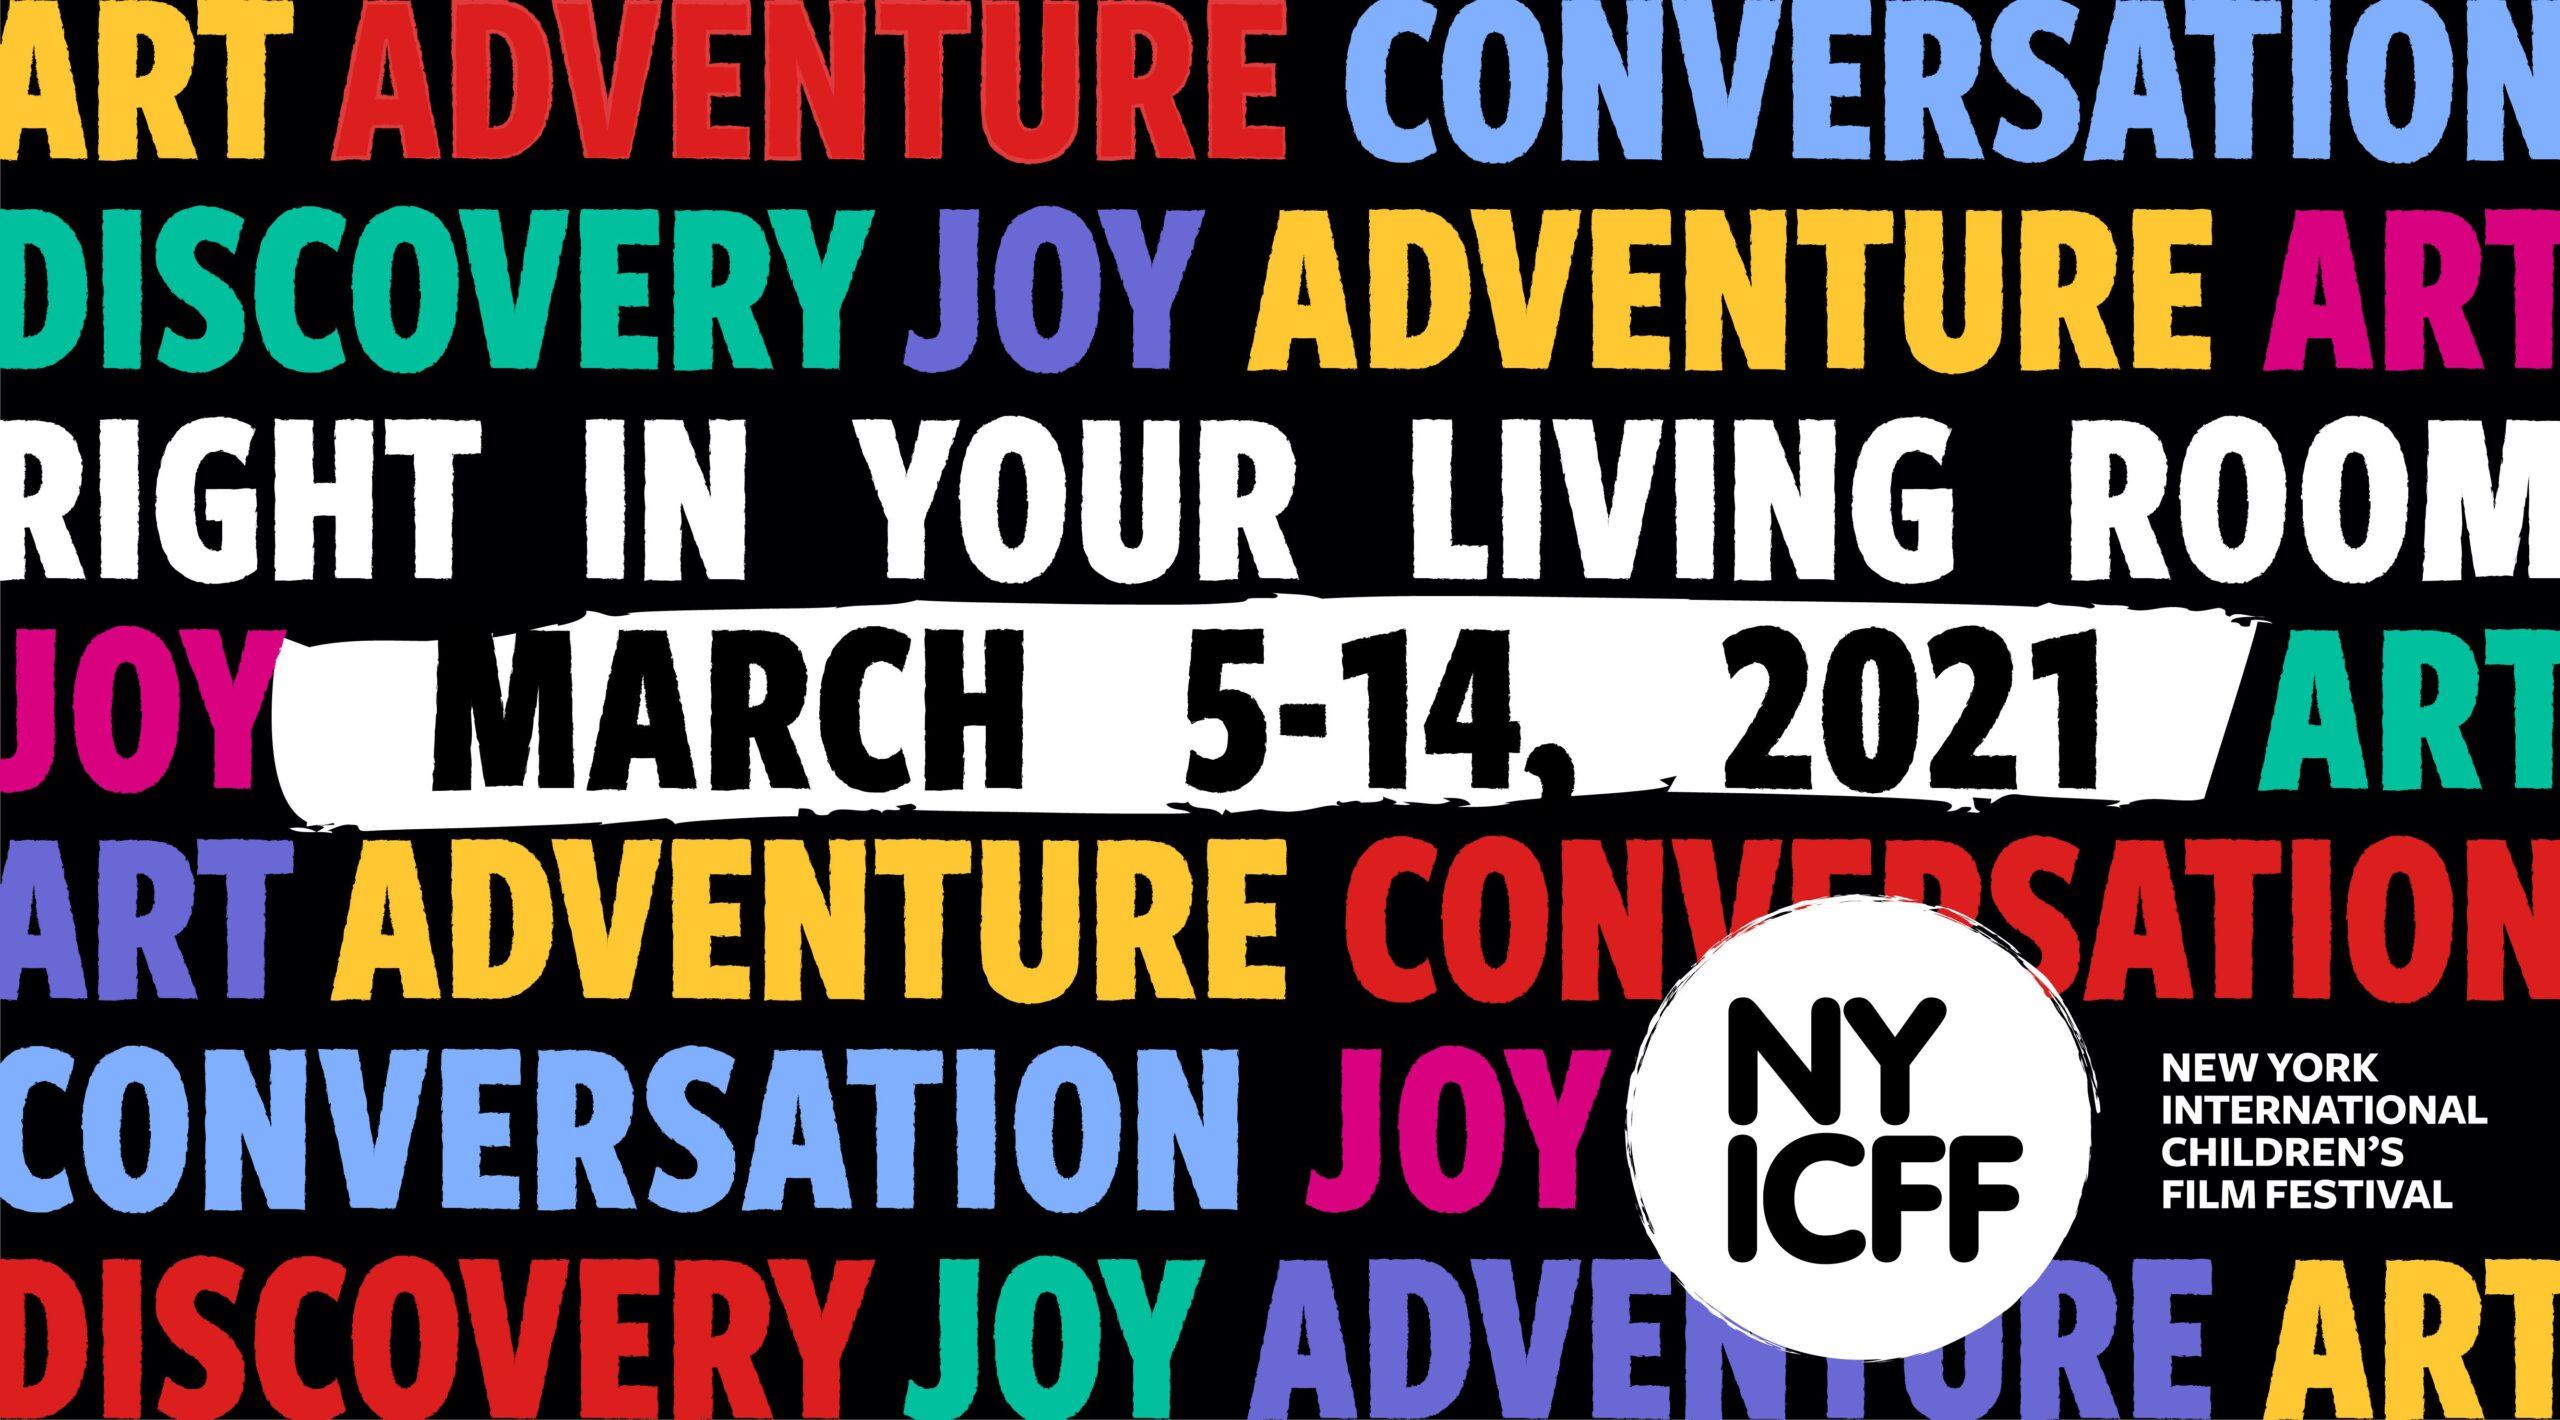 New York International Children's Film Festival, NYICFF